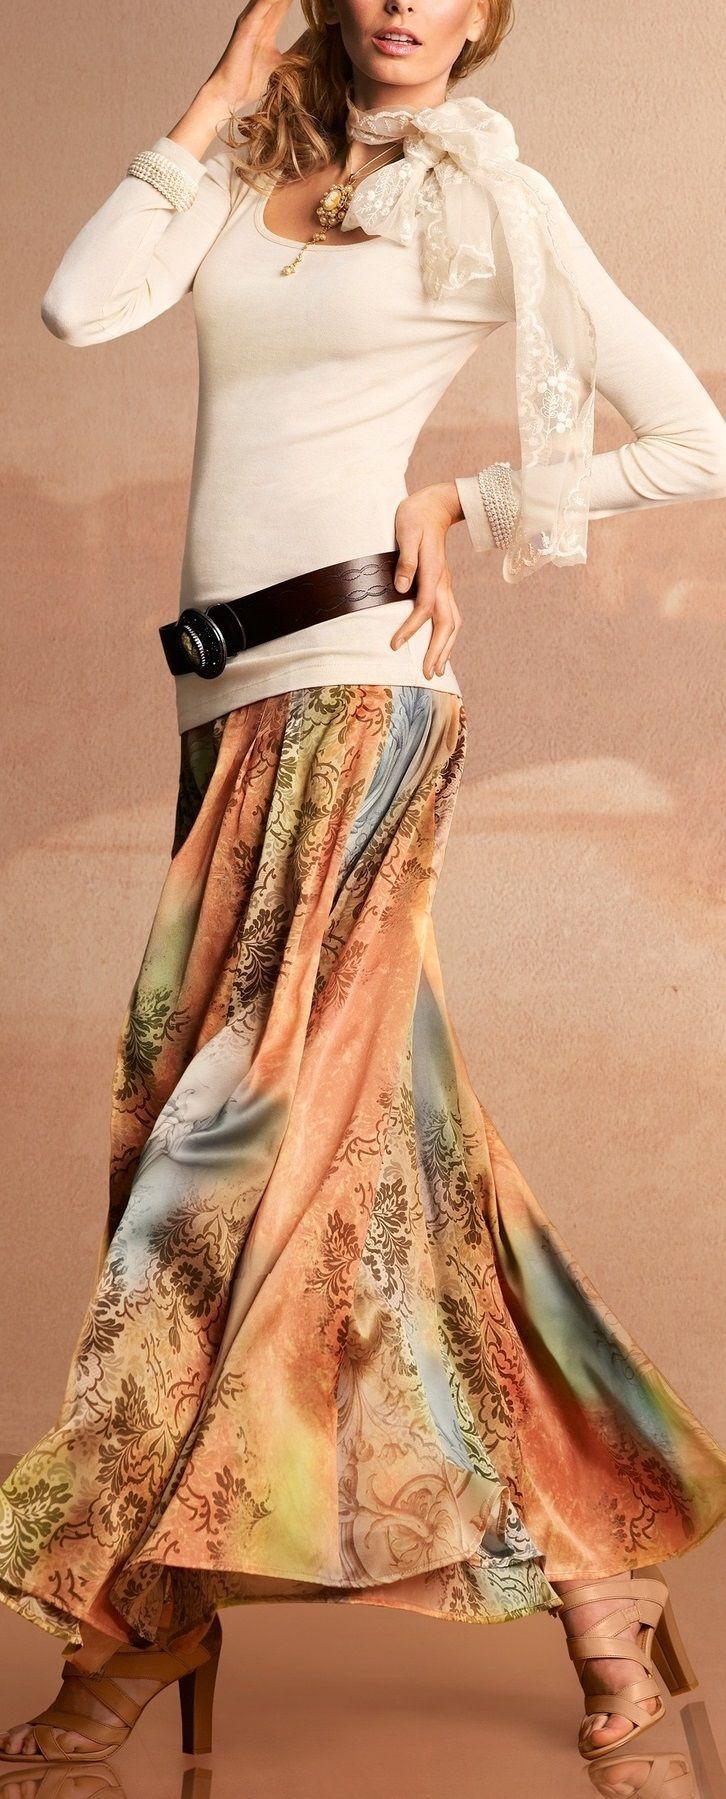 long skirt ... THIS IS TOOOOO  LOVELY !!!!